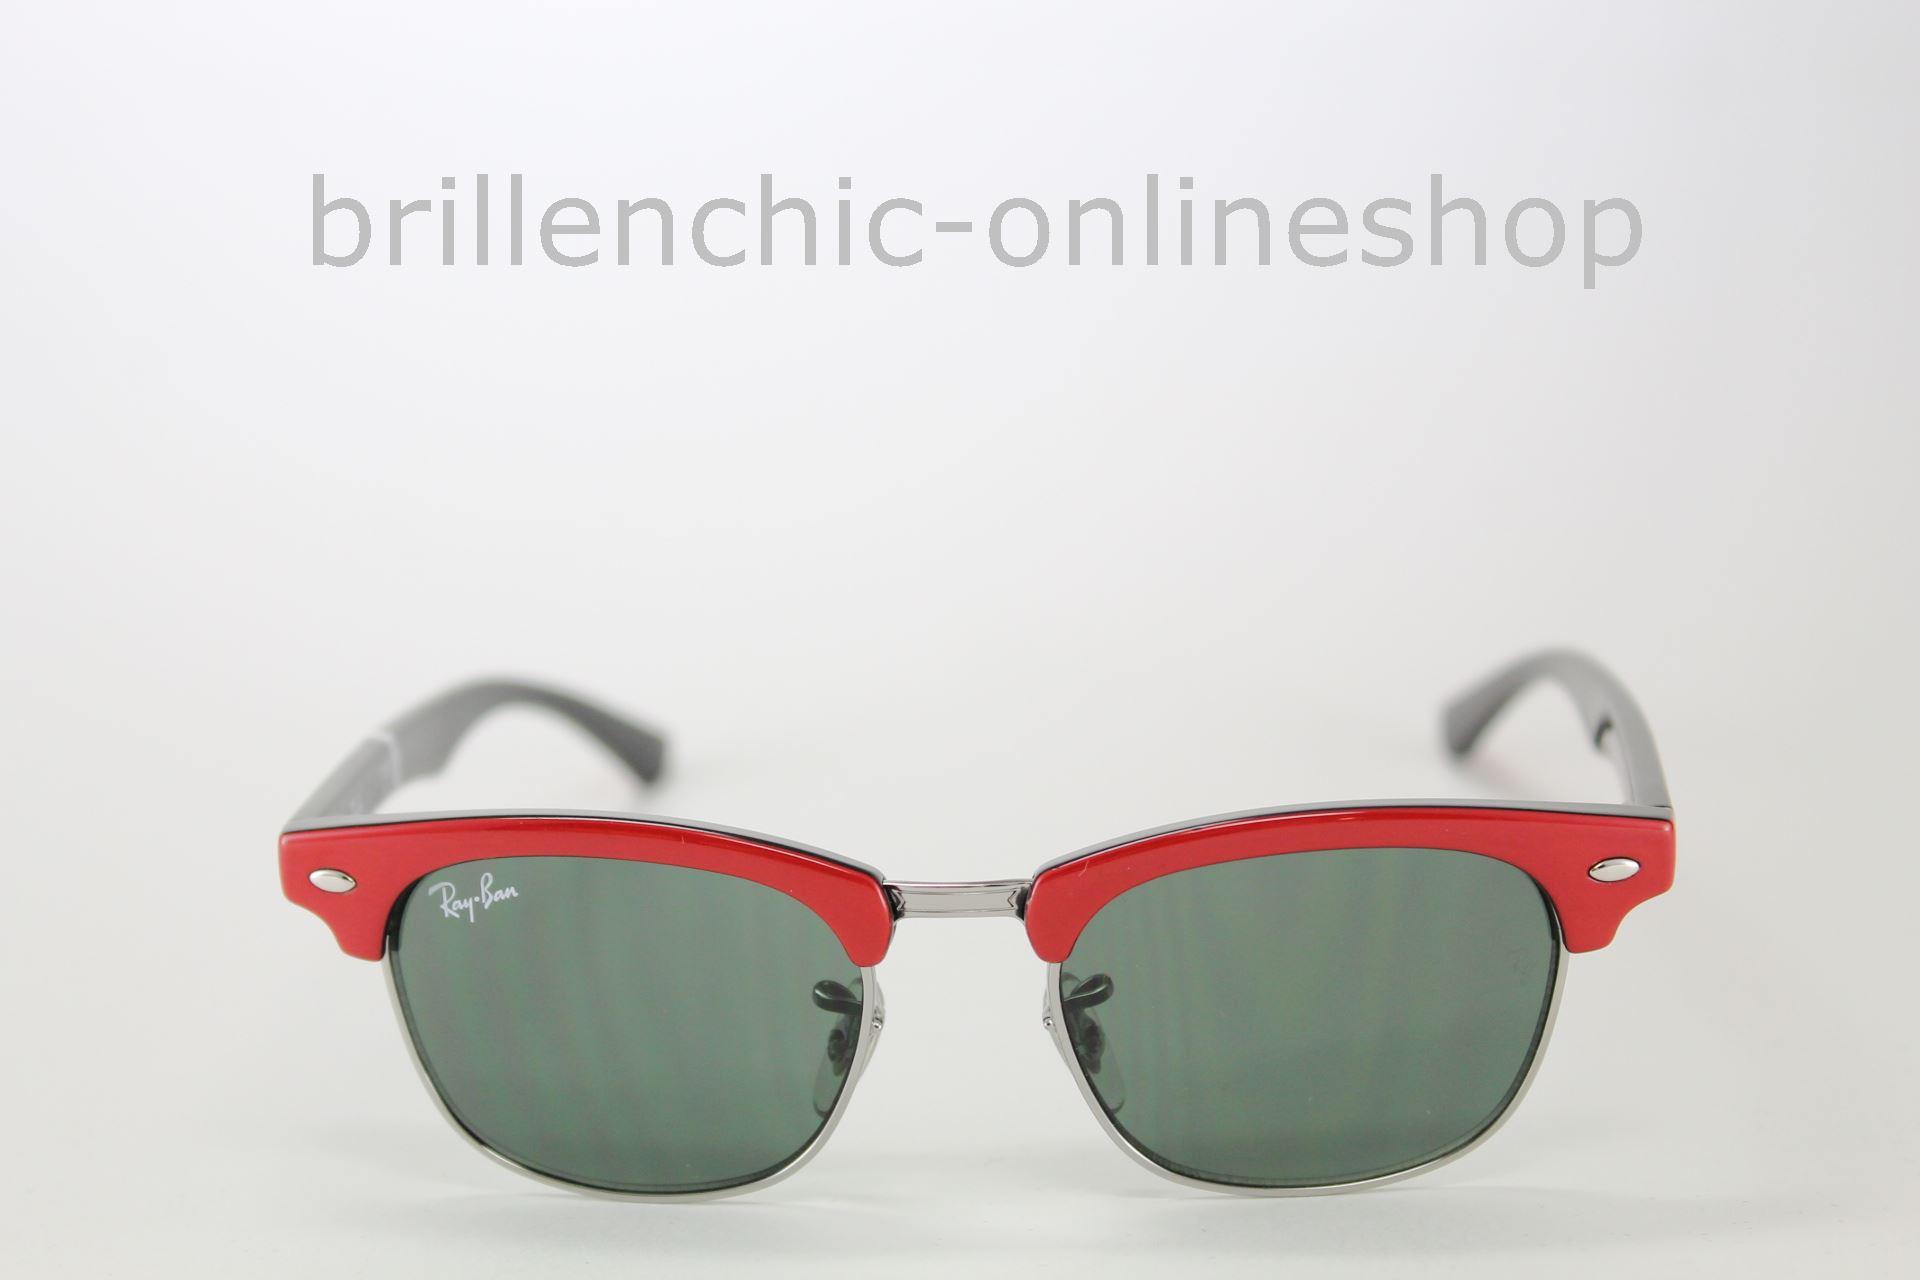 6cb5112eb3 Brillenchic-onlineshop in Berlin - Ray Ban JUNIOR RJ 9050S 9050 162 ...